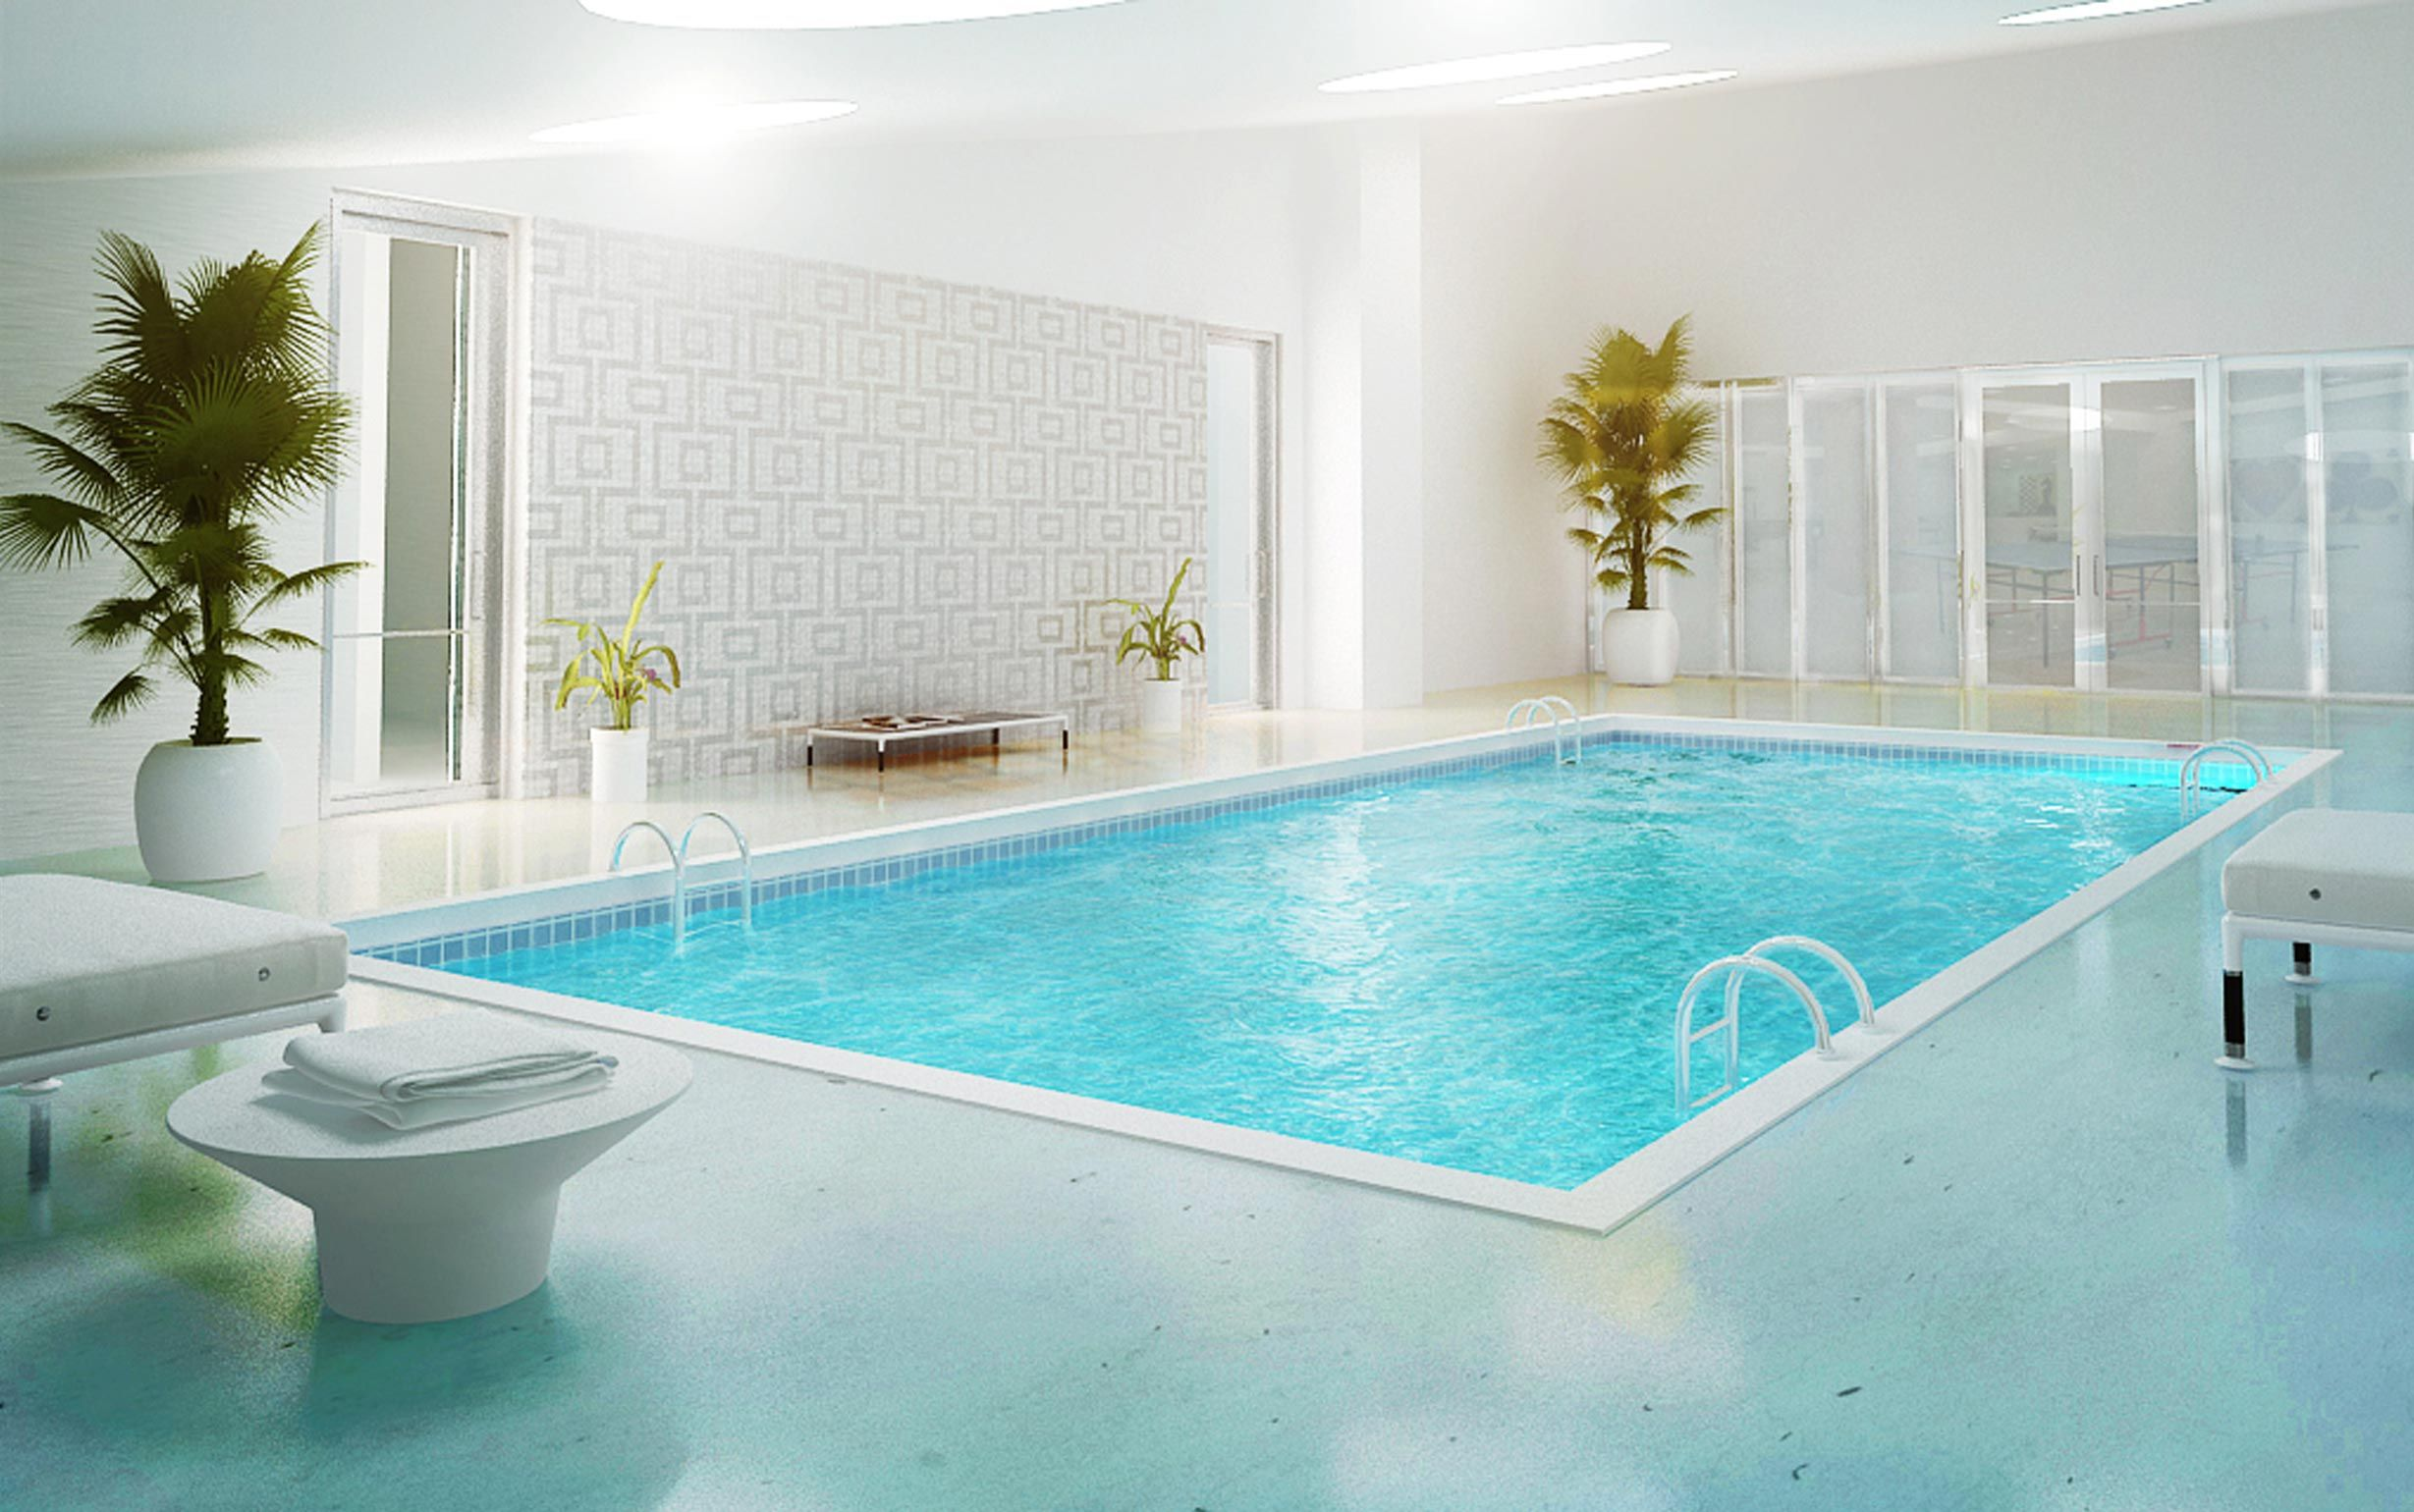 Godrej Platinum Bengaluru Indoor Heated Pool Client Godrej Properties Ltd Luxury Swimming Pools Swimming Pool Architecture Indoor Pool Design